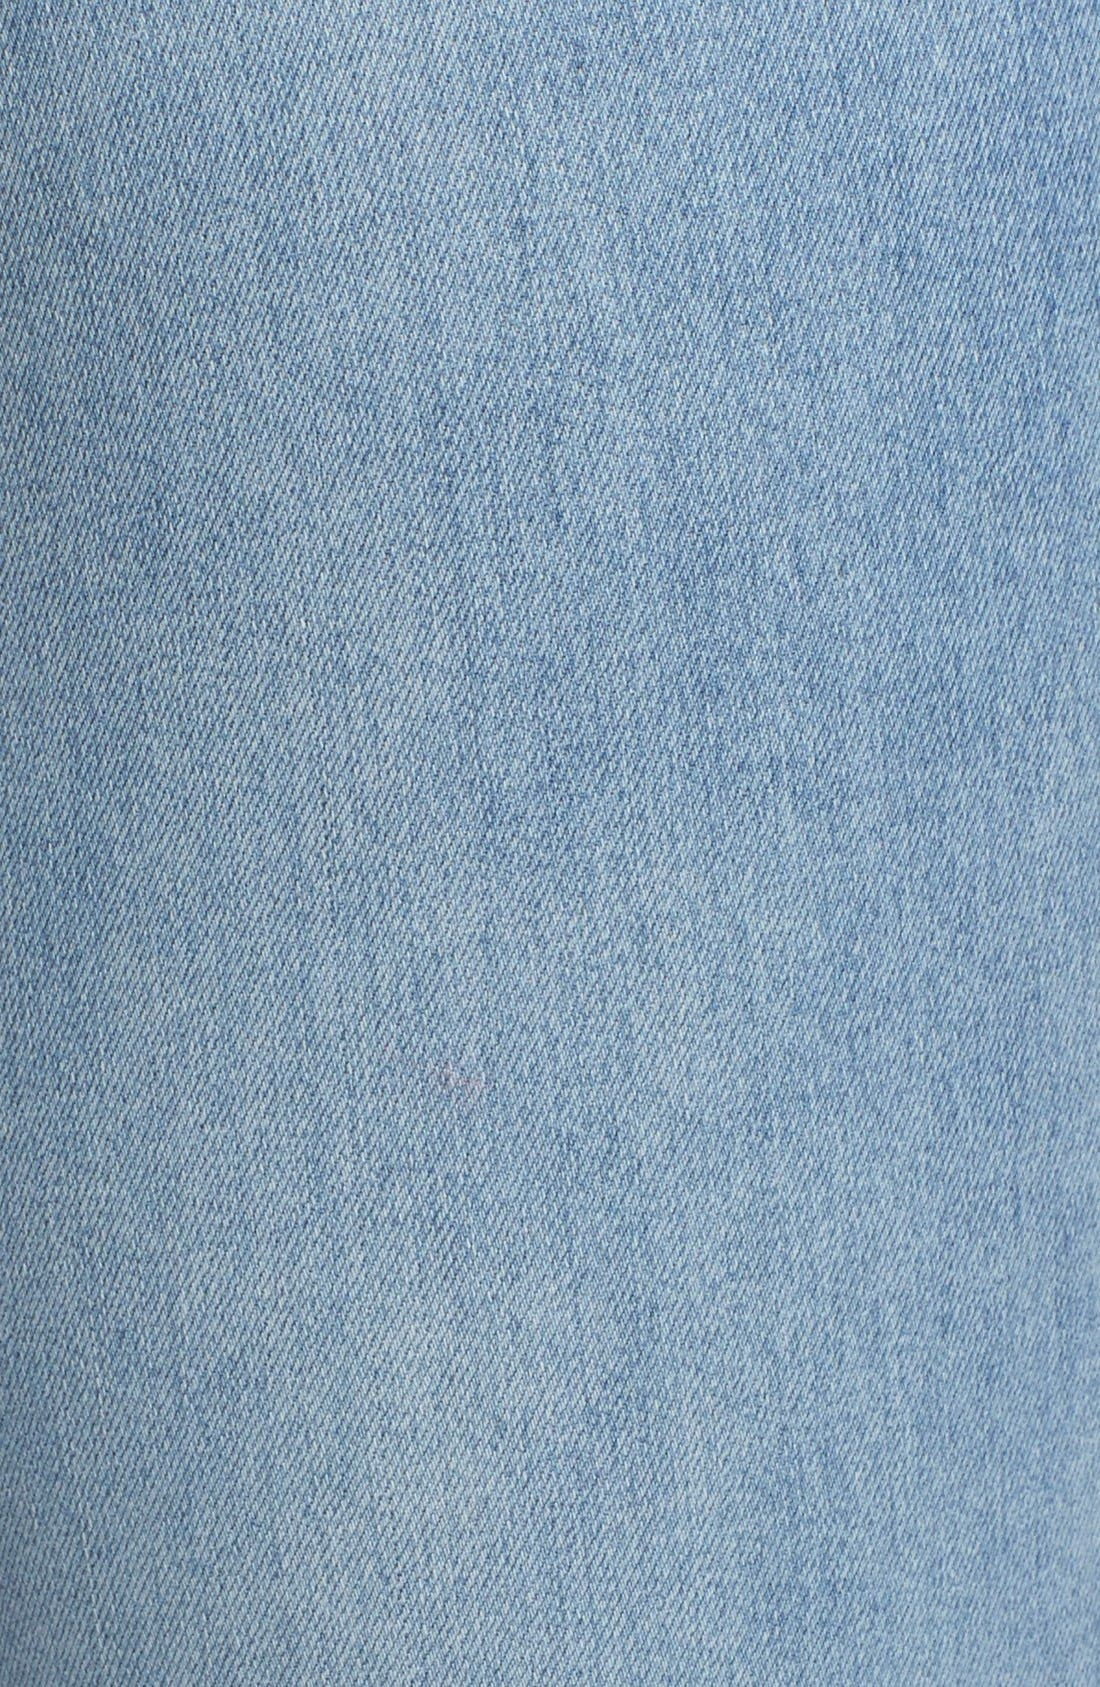 Alternate Image 5  - Free People Destroyed Skinny Jeans